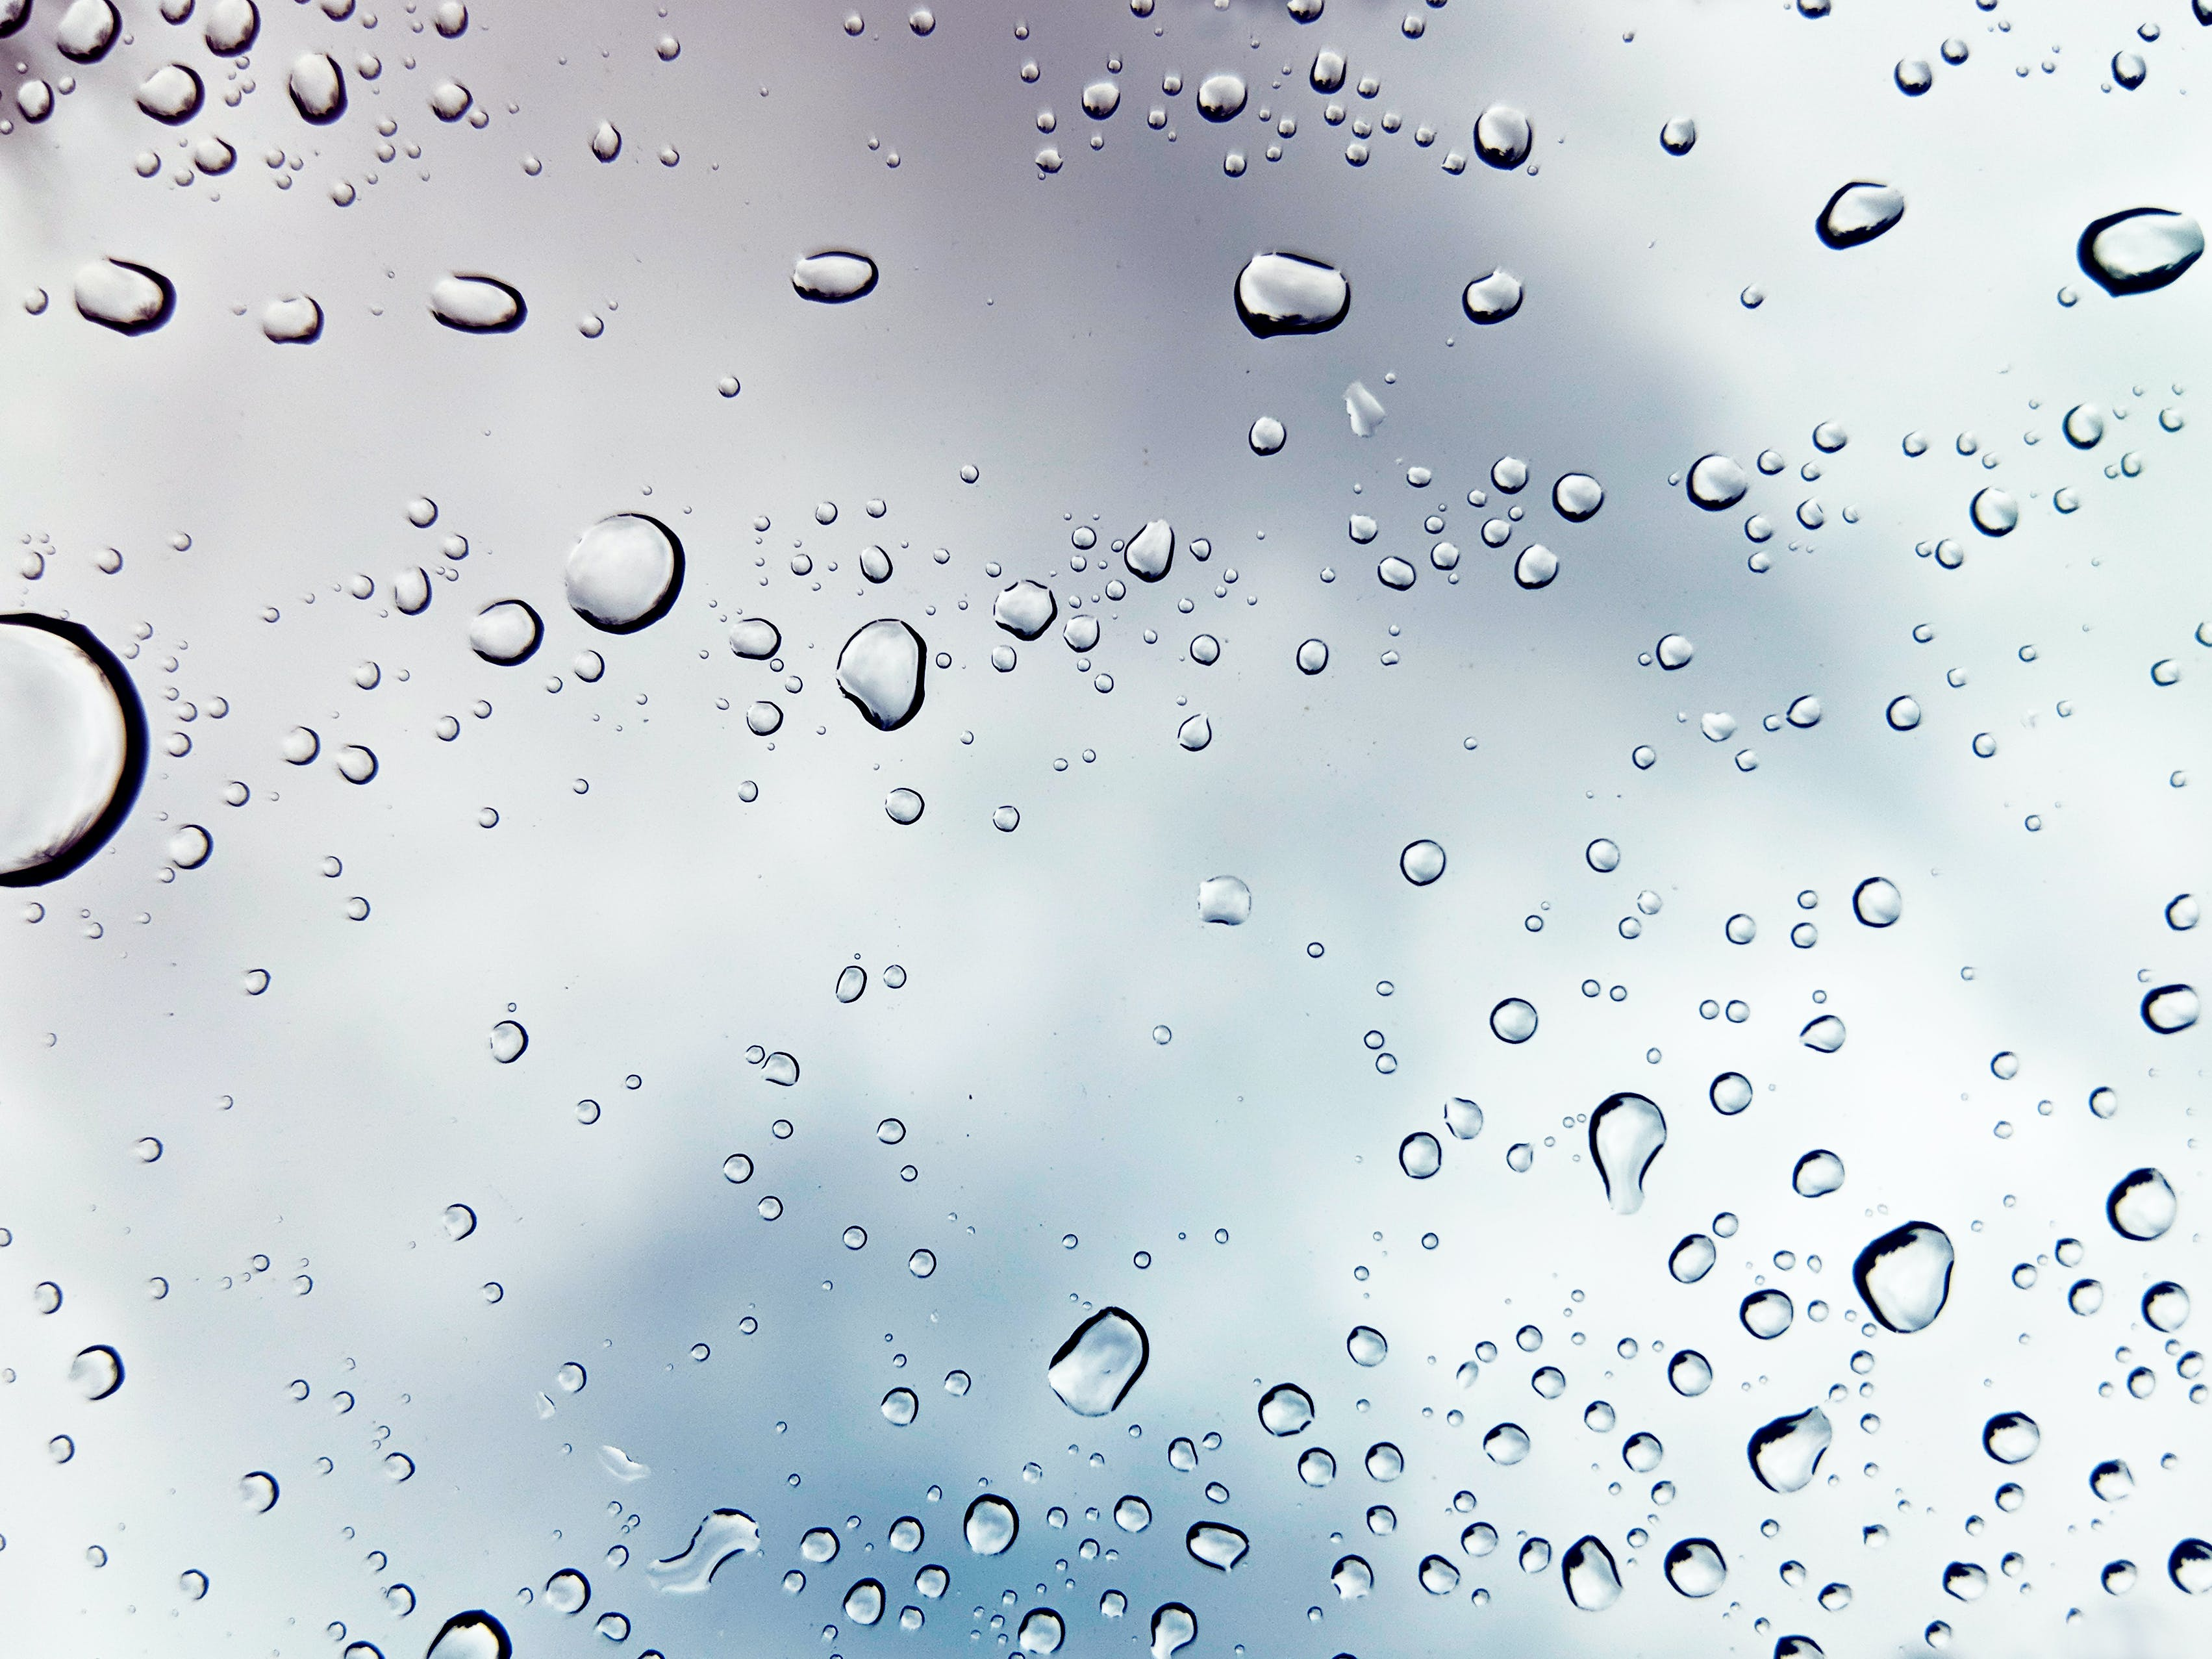 Macro Shot Photography of Water Drops